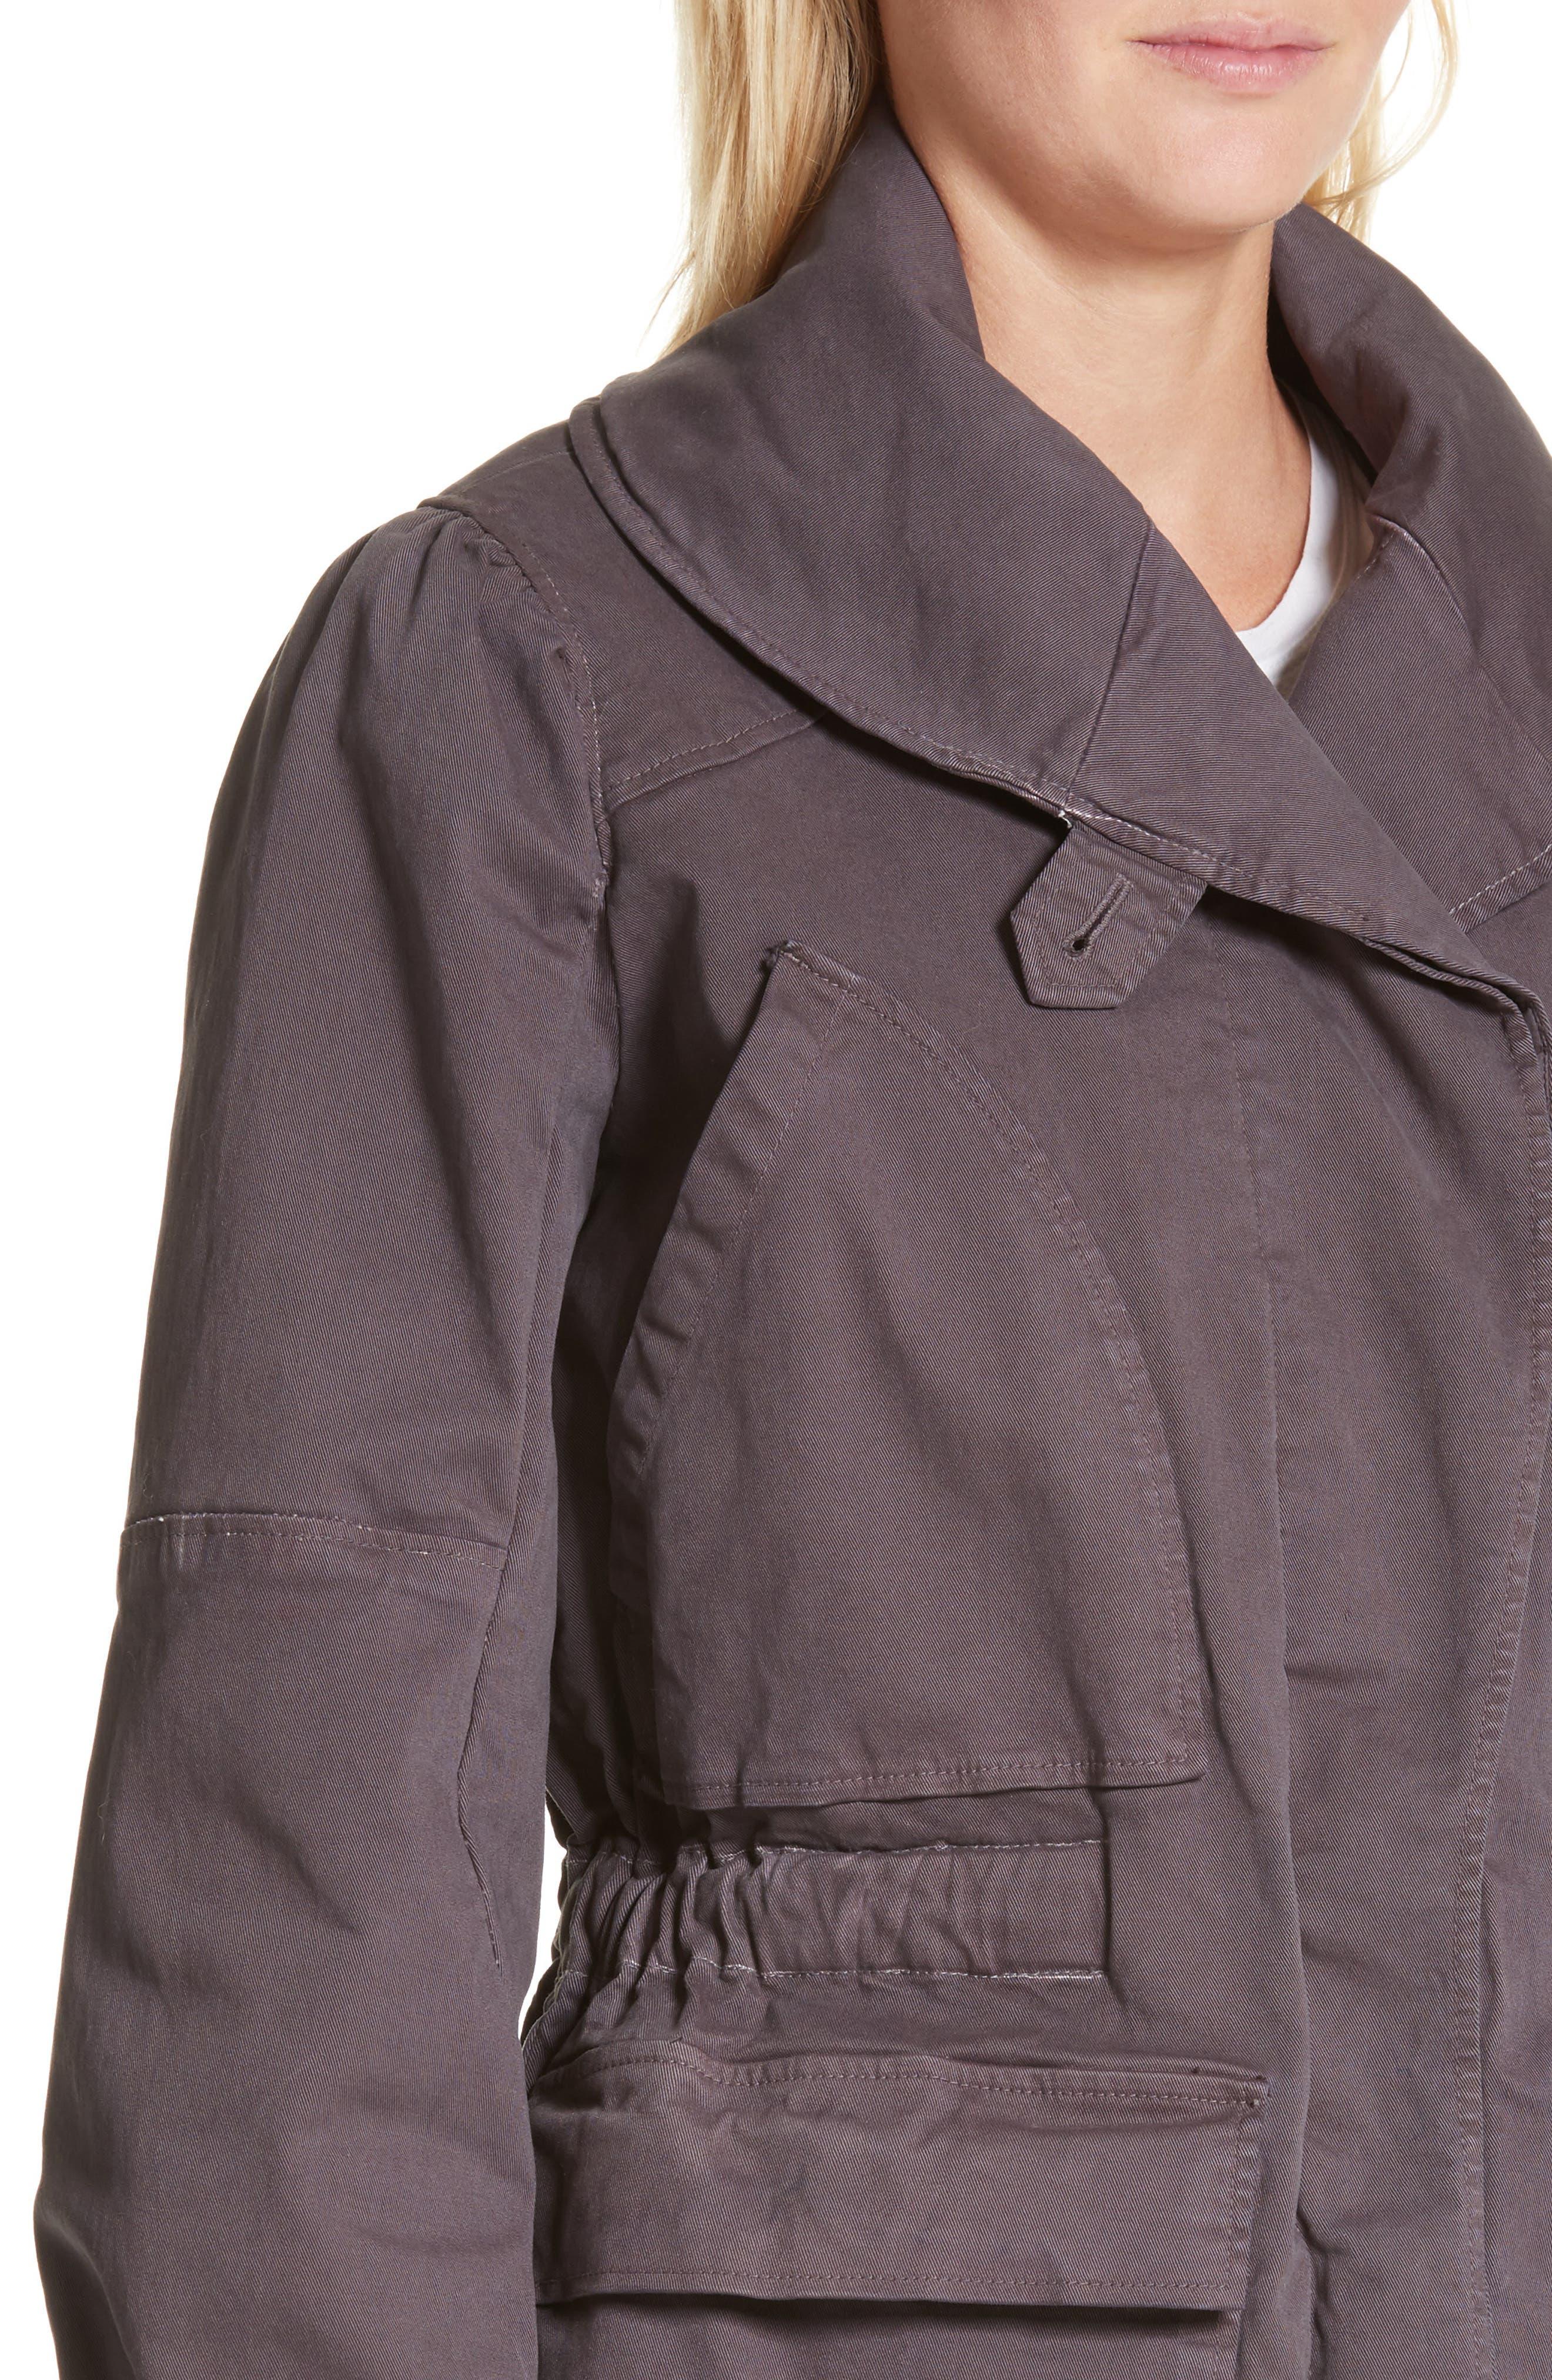 Twill Utility Jacket,                             Alternate thumbnail 4, color,                             099